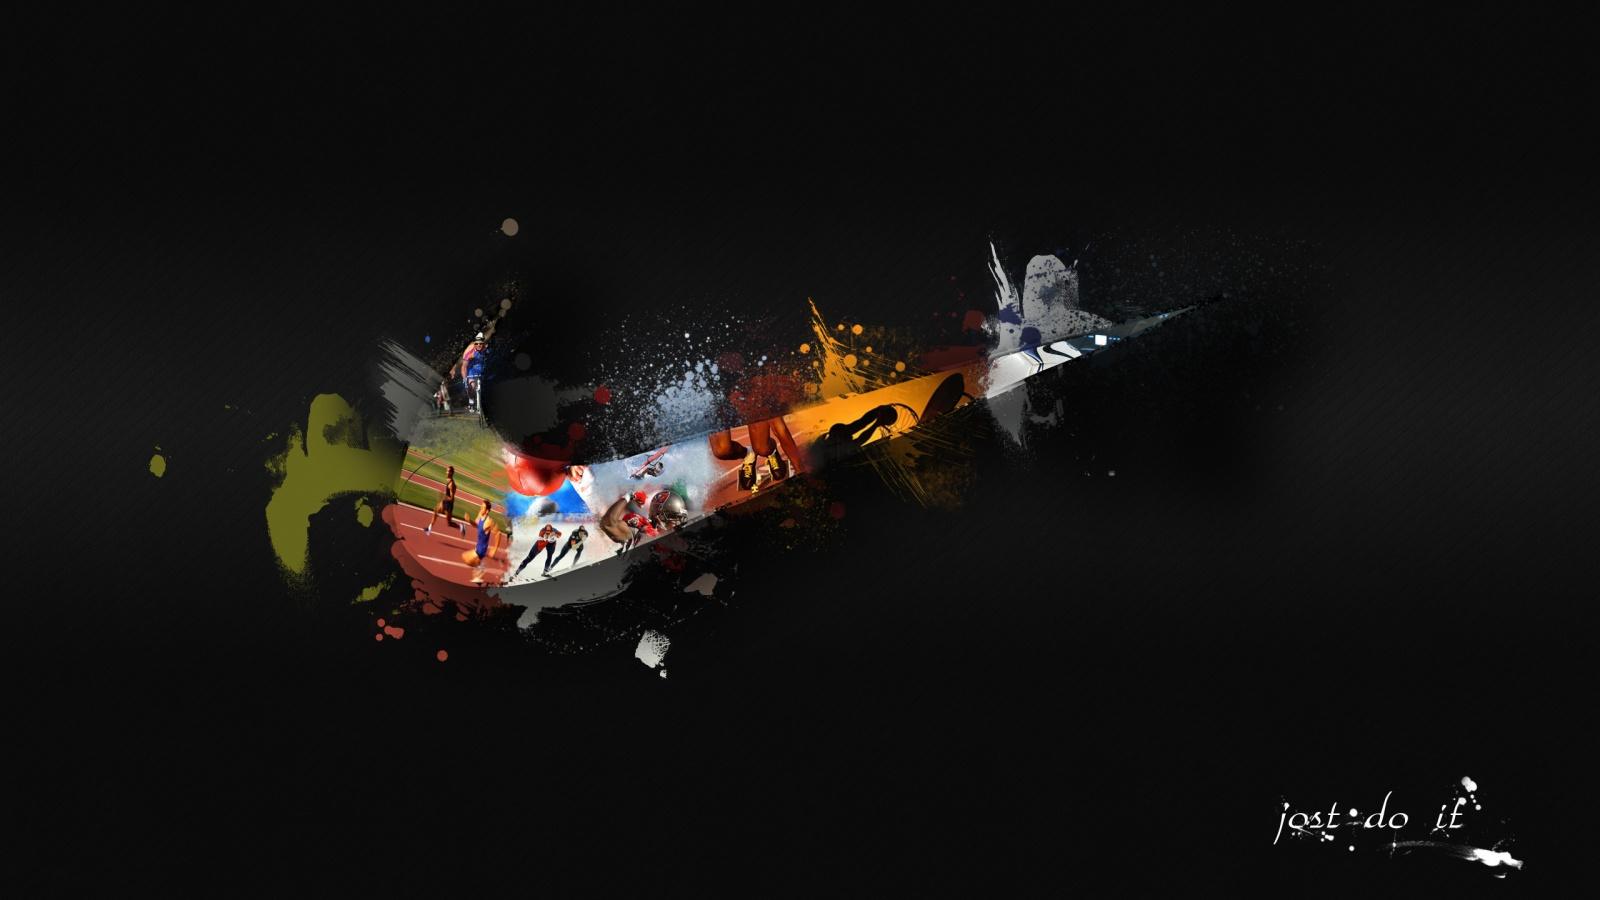 Nike just do it logo iphone wallpaper download roblox - Nike Just Do It Wallpapers Hd Wallpapers